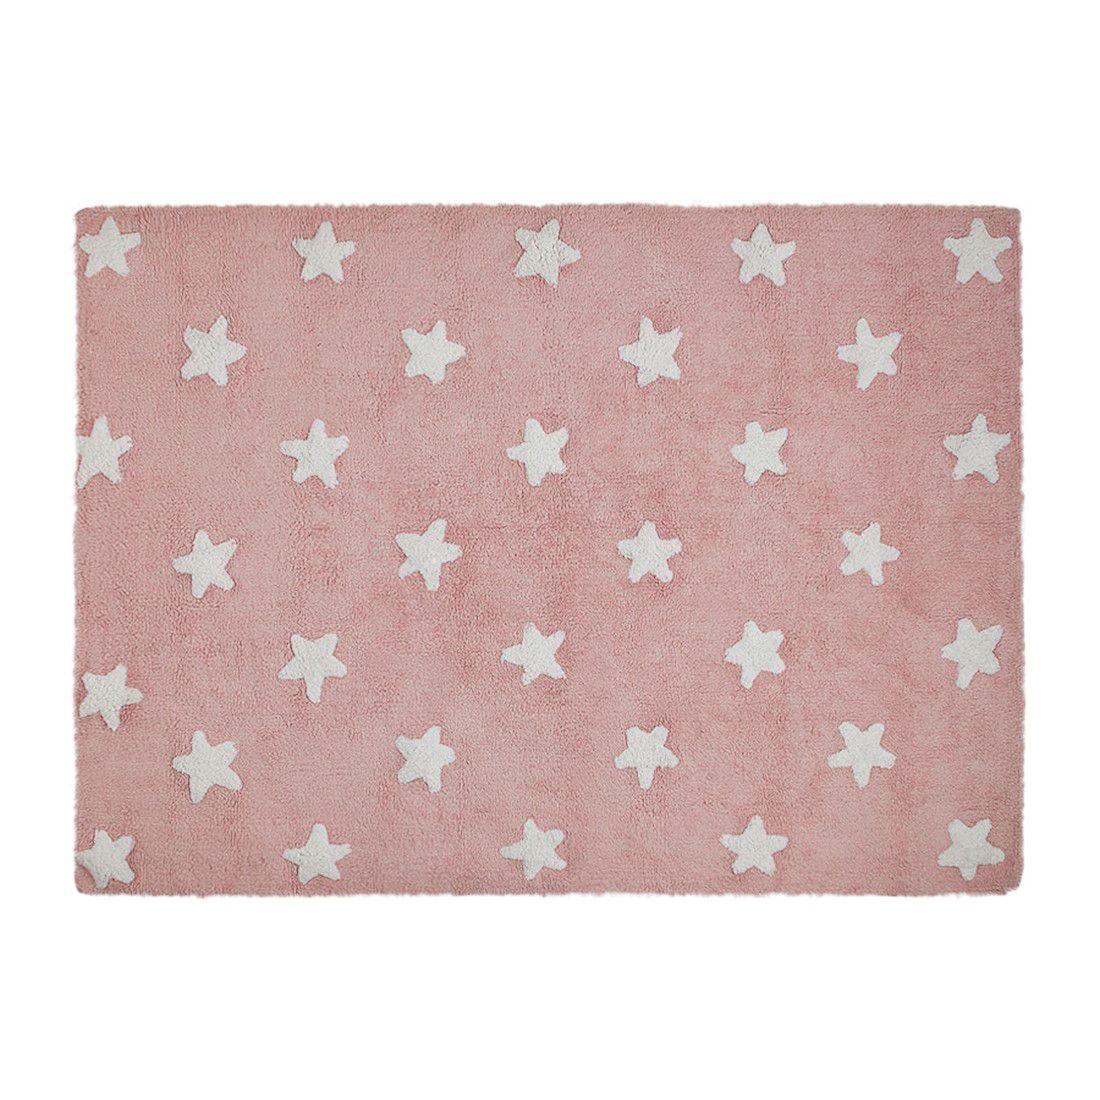 Tapete Lorena Canals Estrelas Rosa 120 x 160 cm